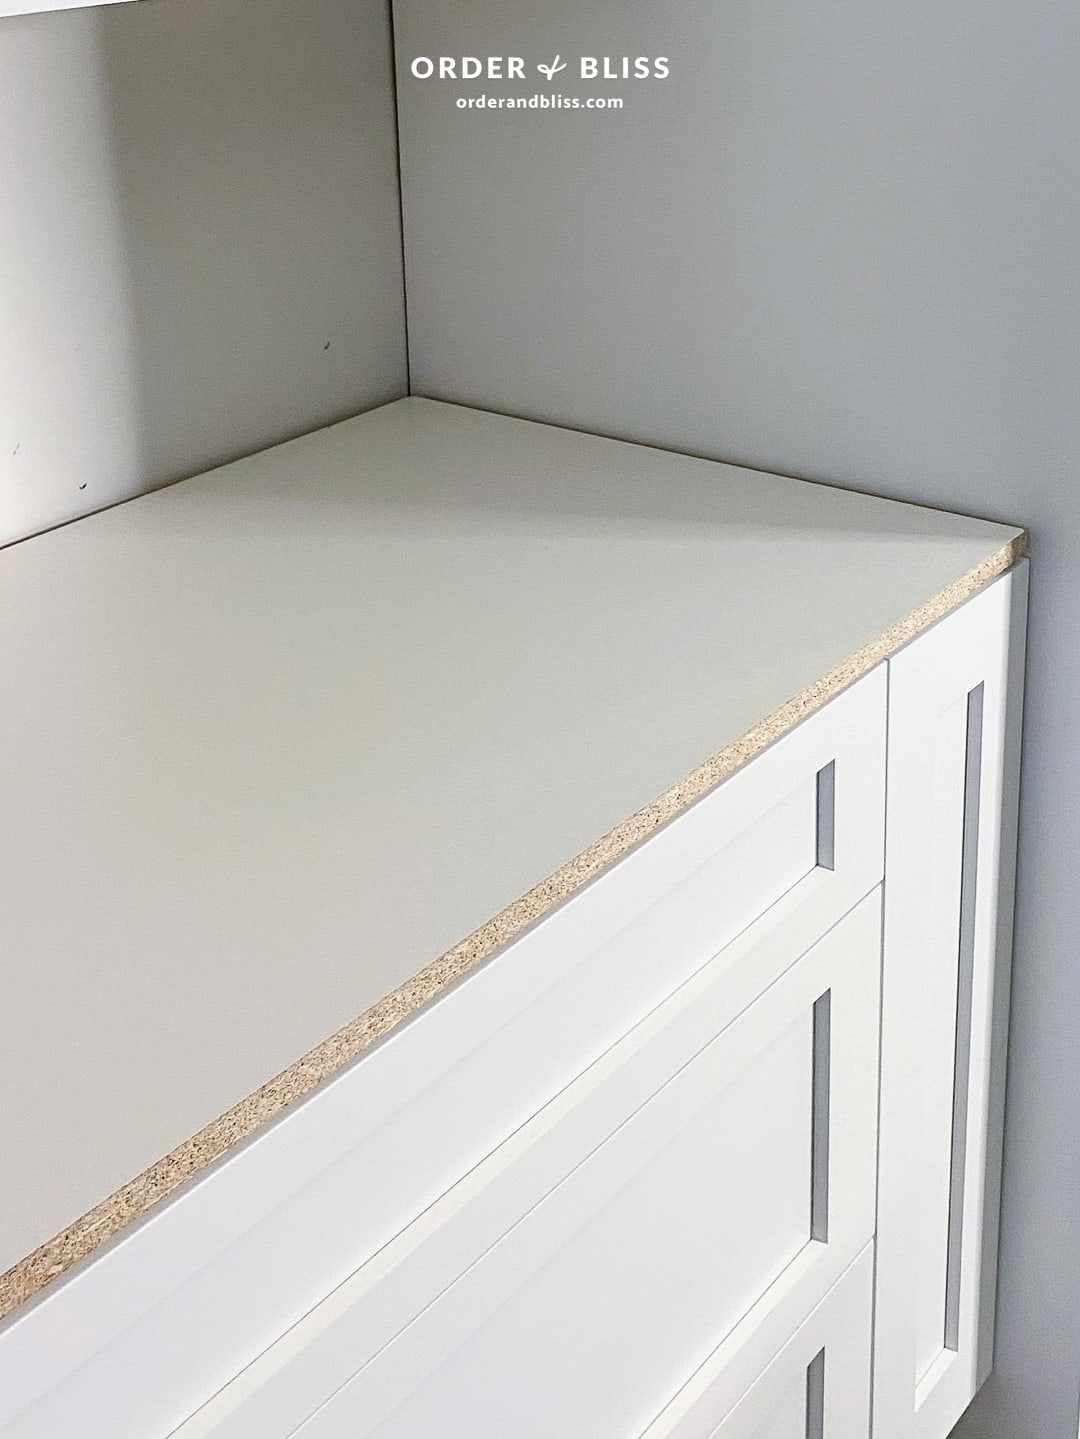 Temporary kitchen countertops using white melamine